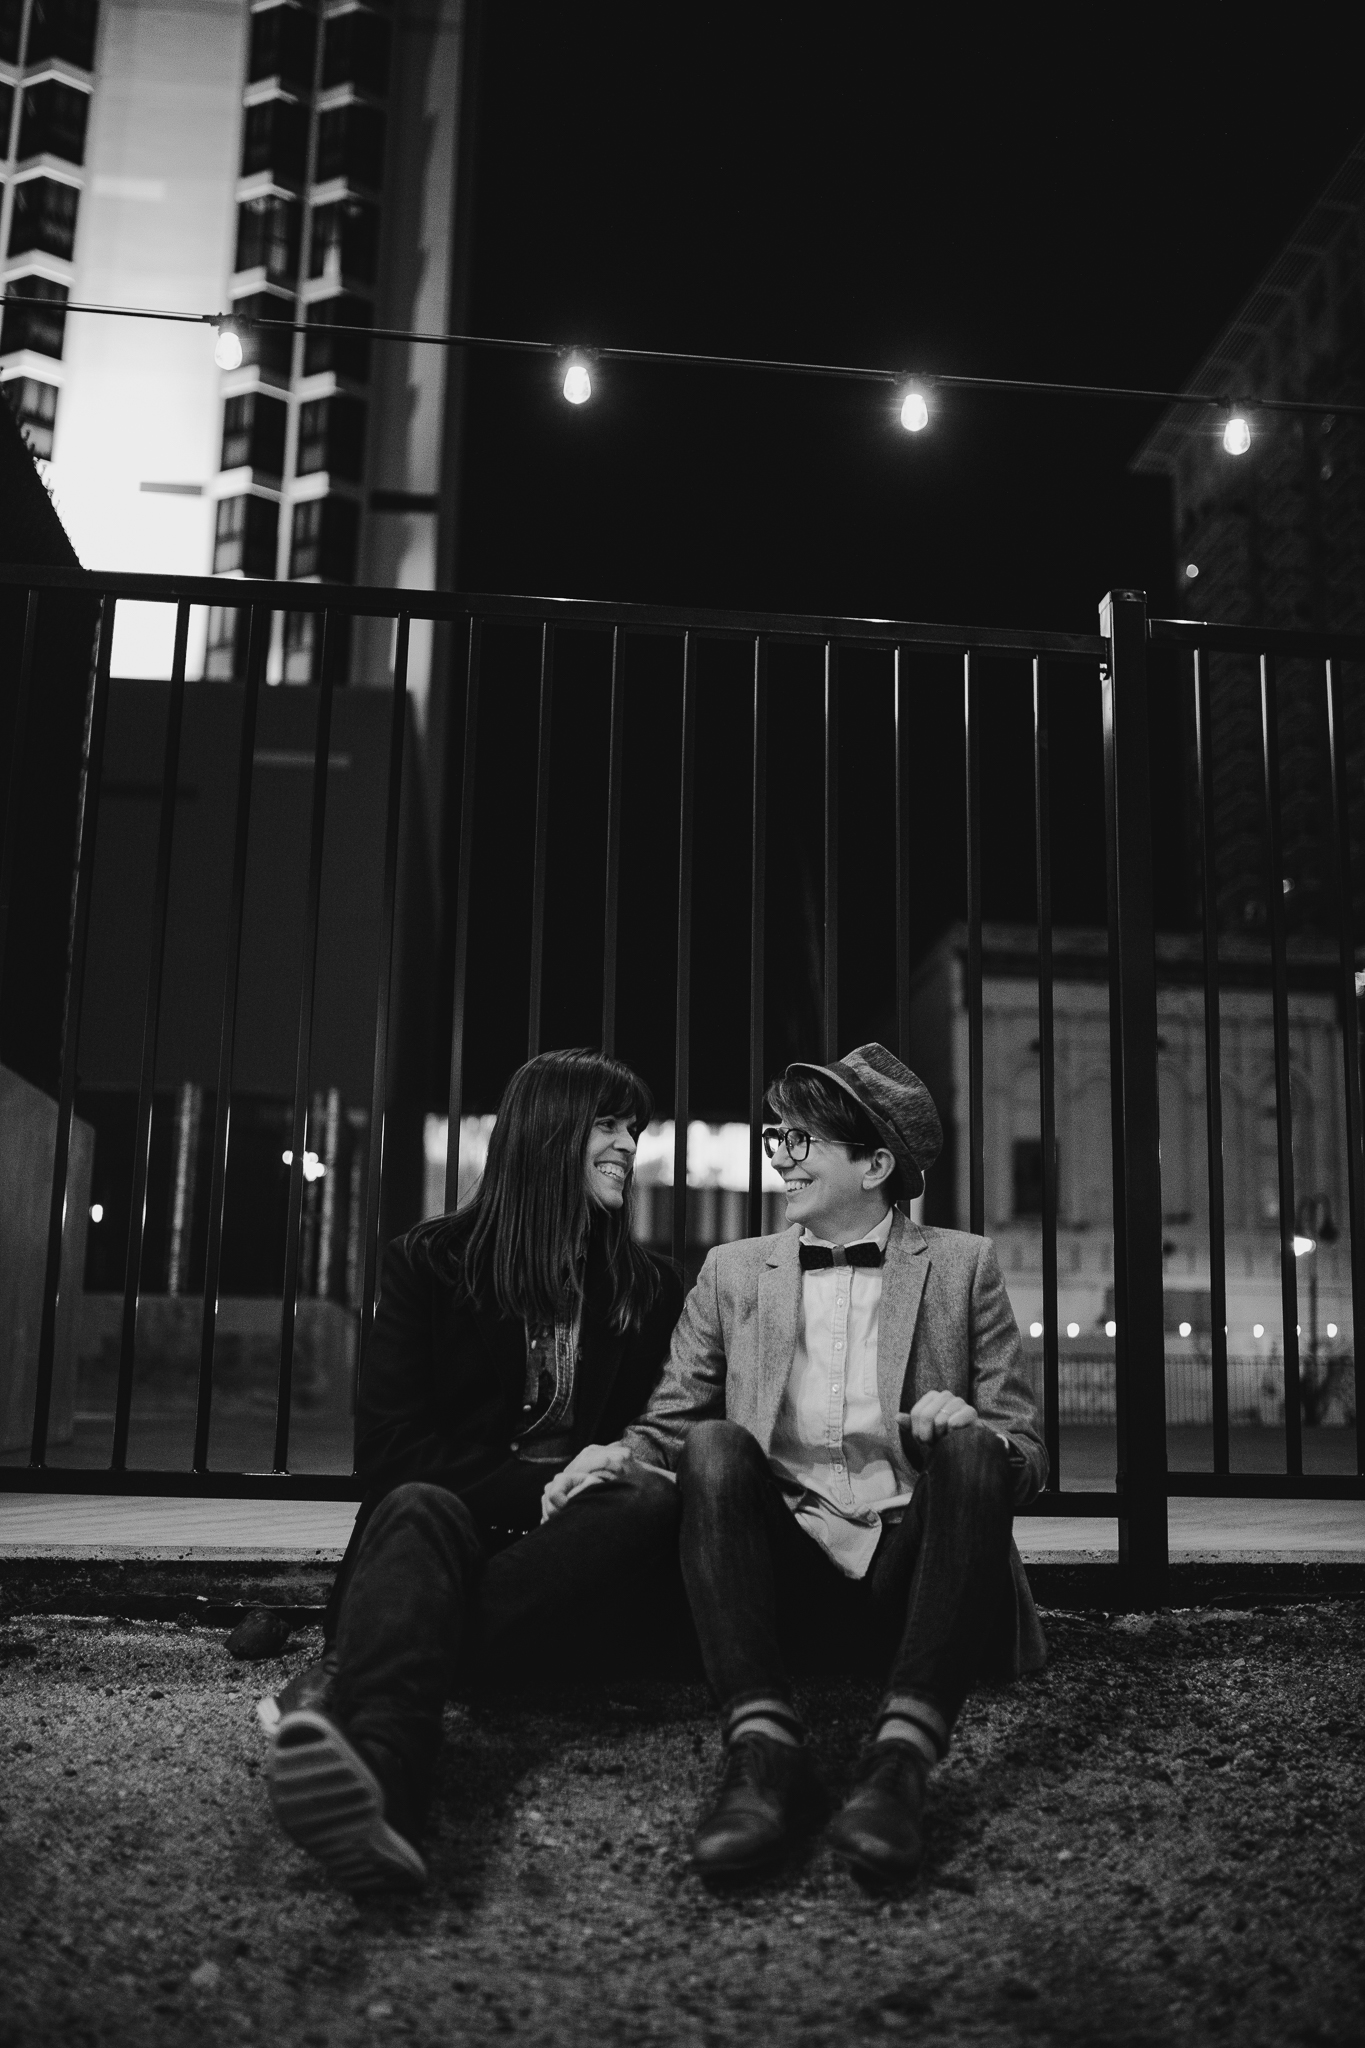 Archer Inspired Photography Hilary and Gia LGTBQ Reno Nevada Couple Wedding Engagement Photographer-27.jpg